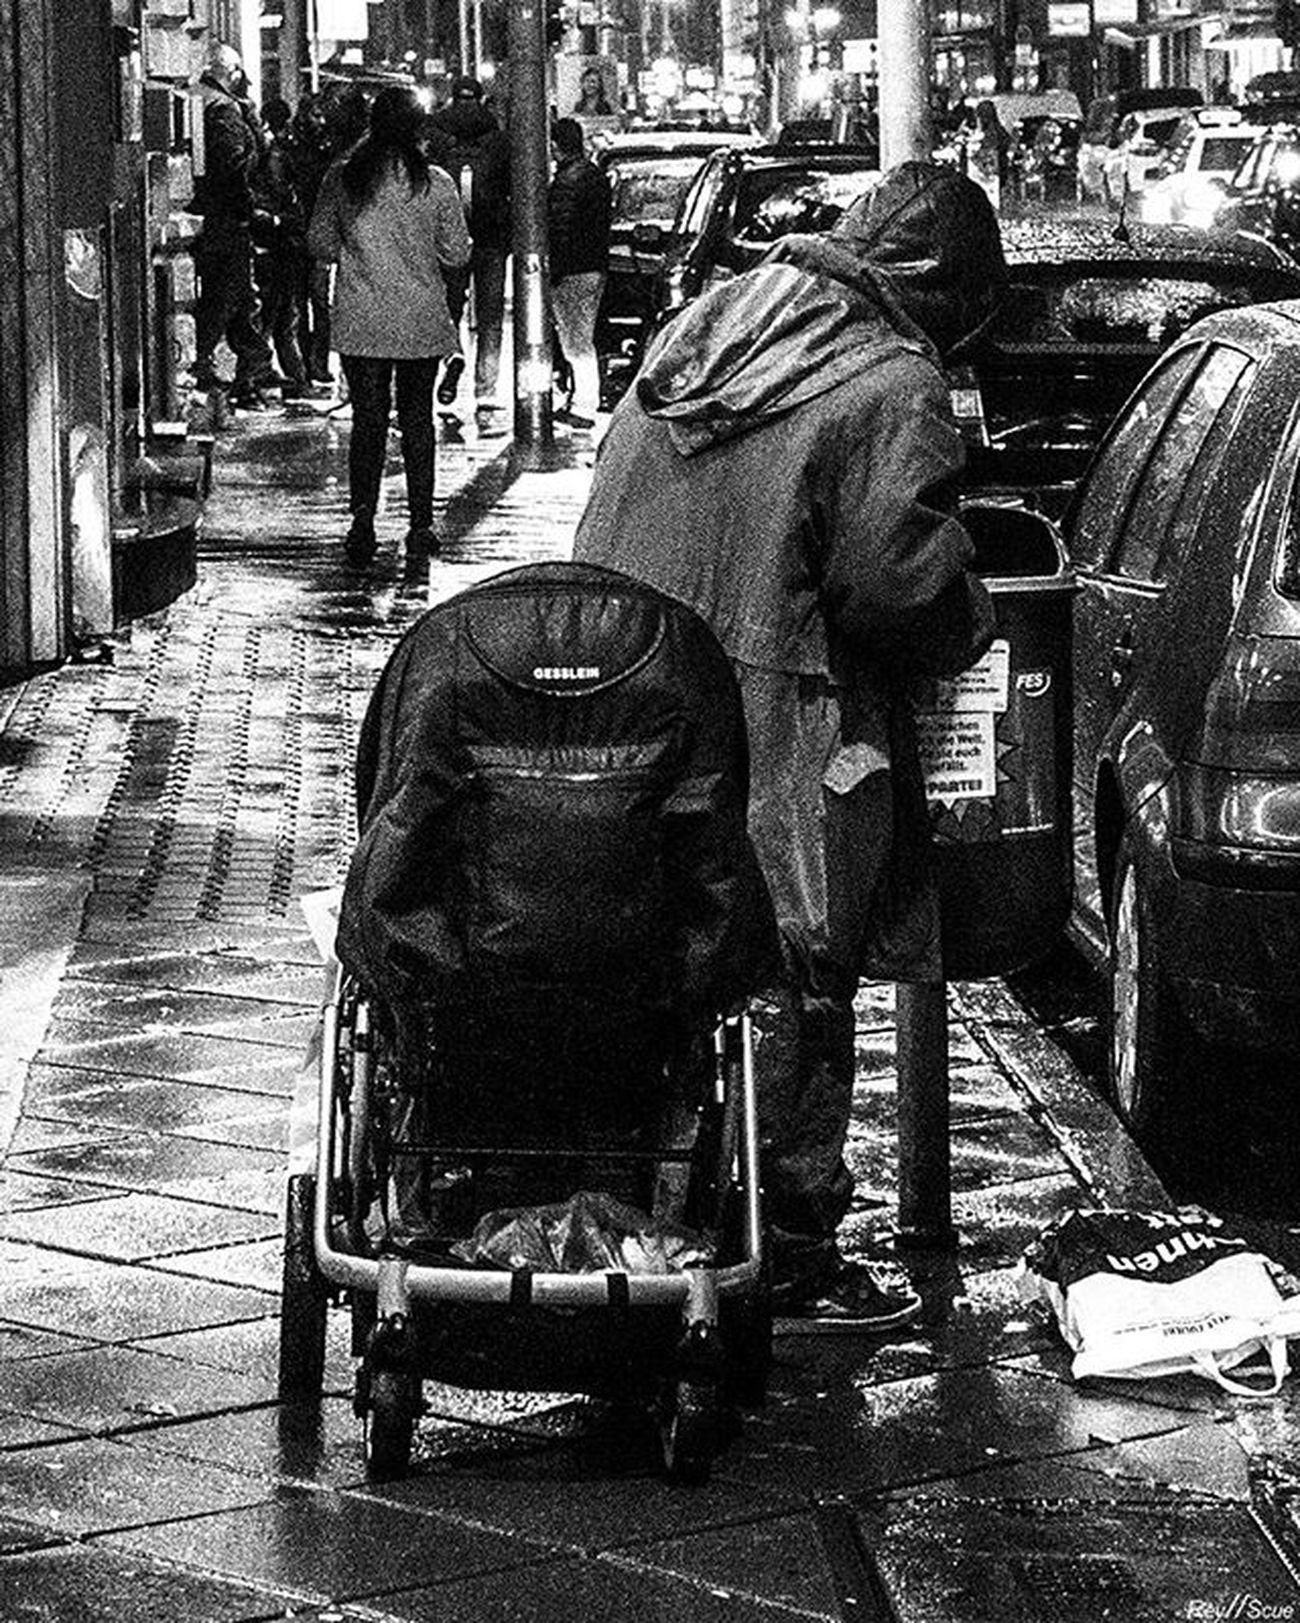 HardTimes Social Documentary Homeless People Frankfurt Germany Freaky Friday Olympus Mft Beststreet Omd Match_bw Reyscue Street Moments Sad Bw_street White Black Blackandwhite Streetphotography Sadness 1 2 3